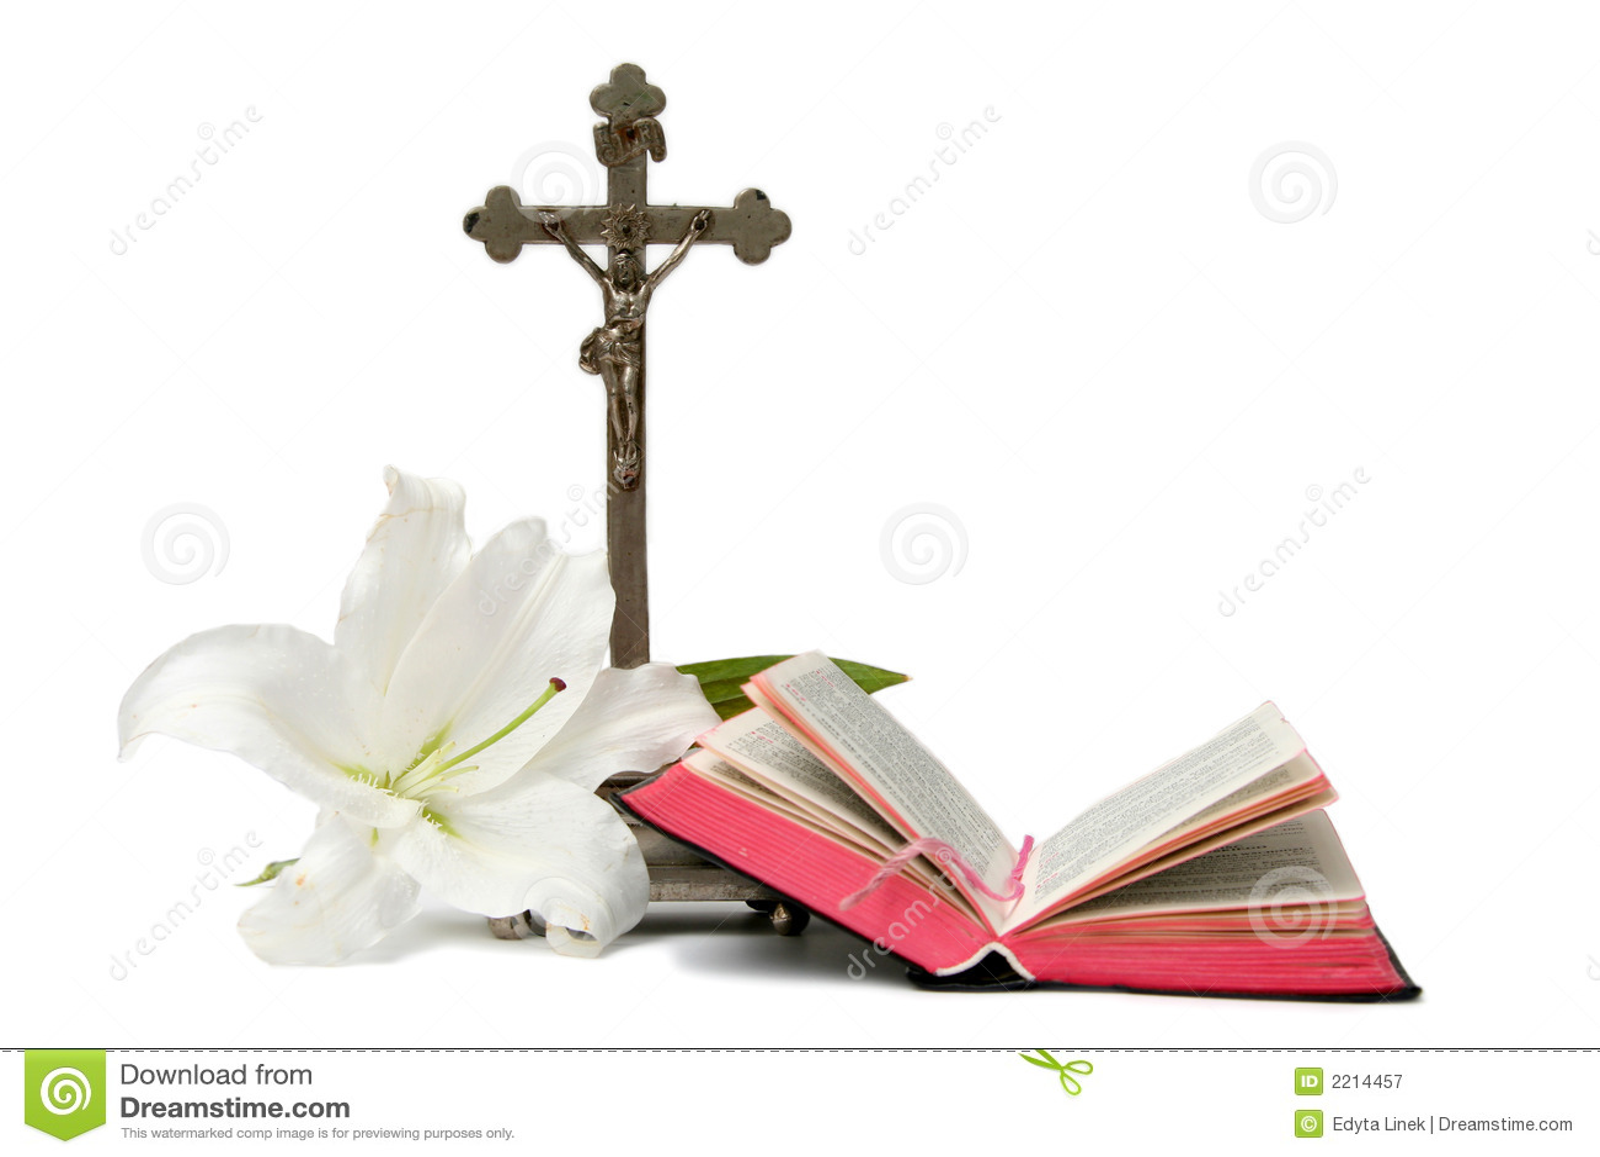 Prayerbook stock image  Image of flower, holy, holiday - 2214457